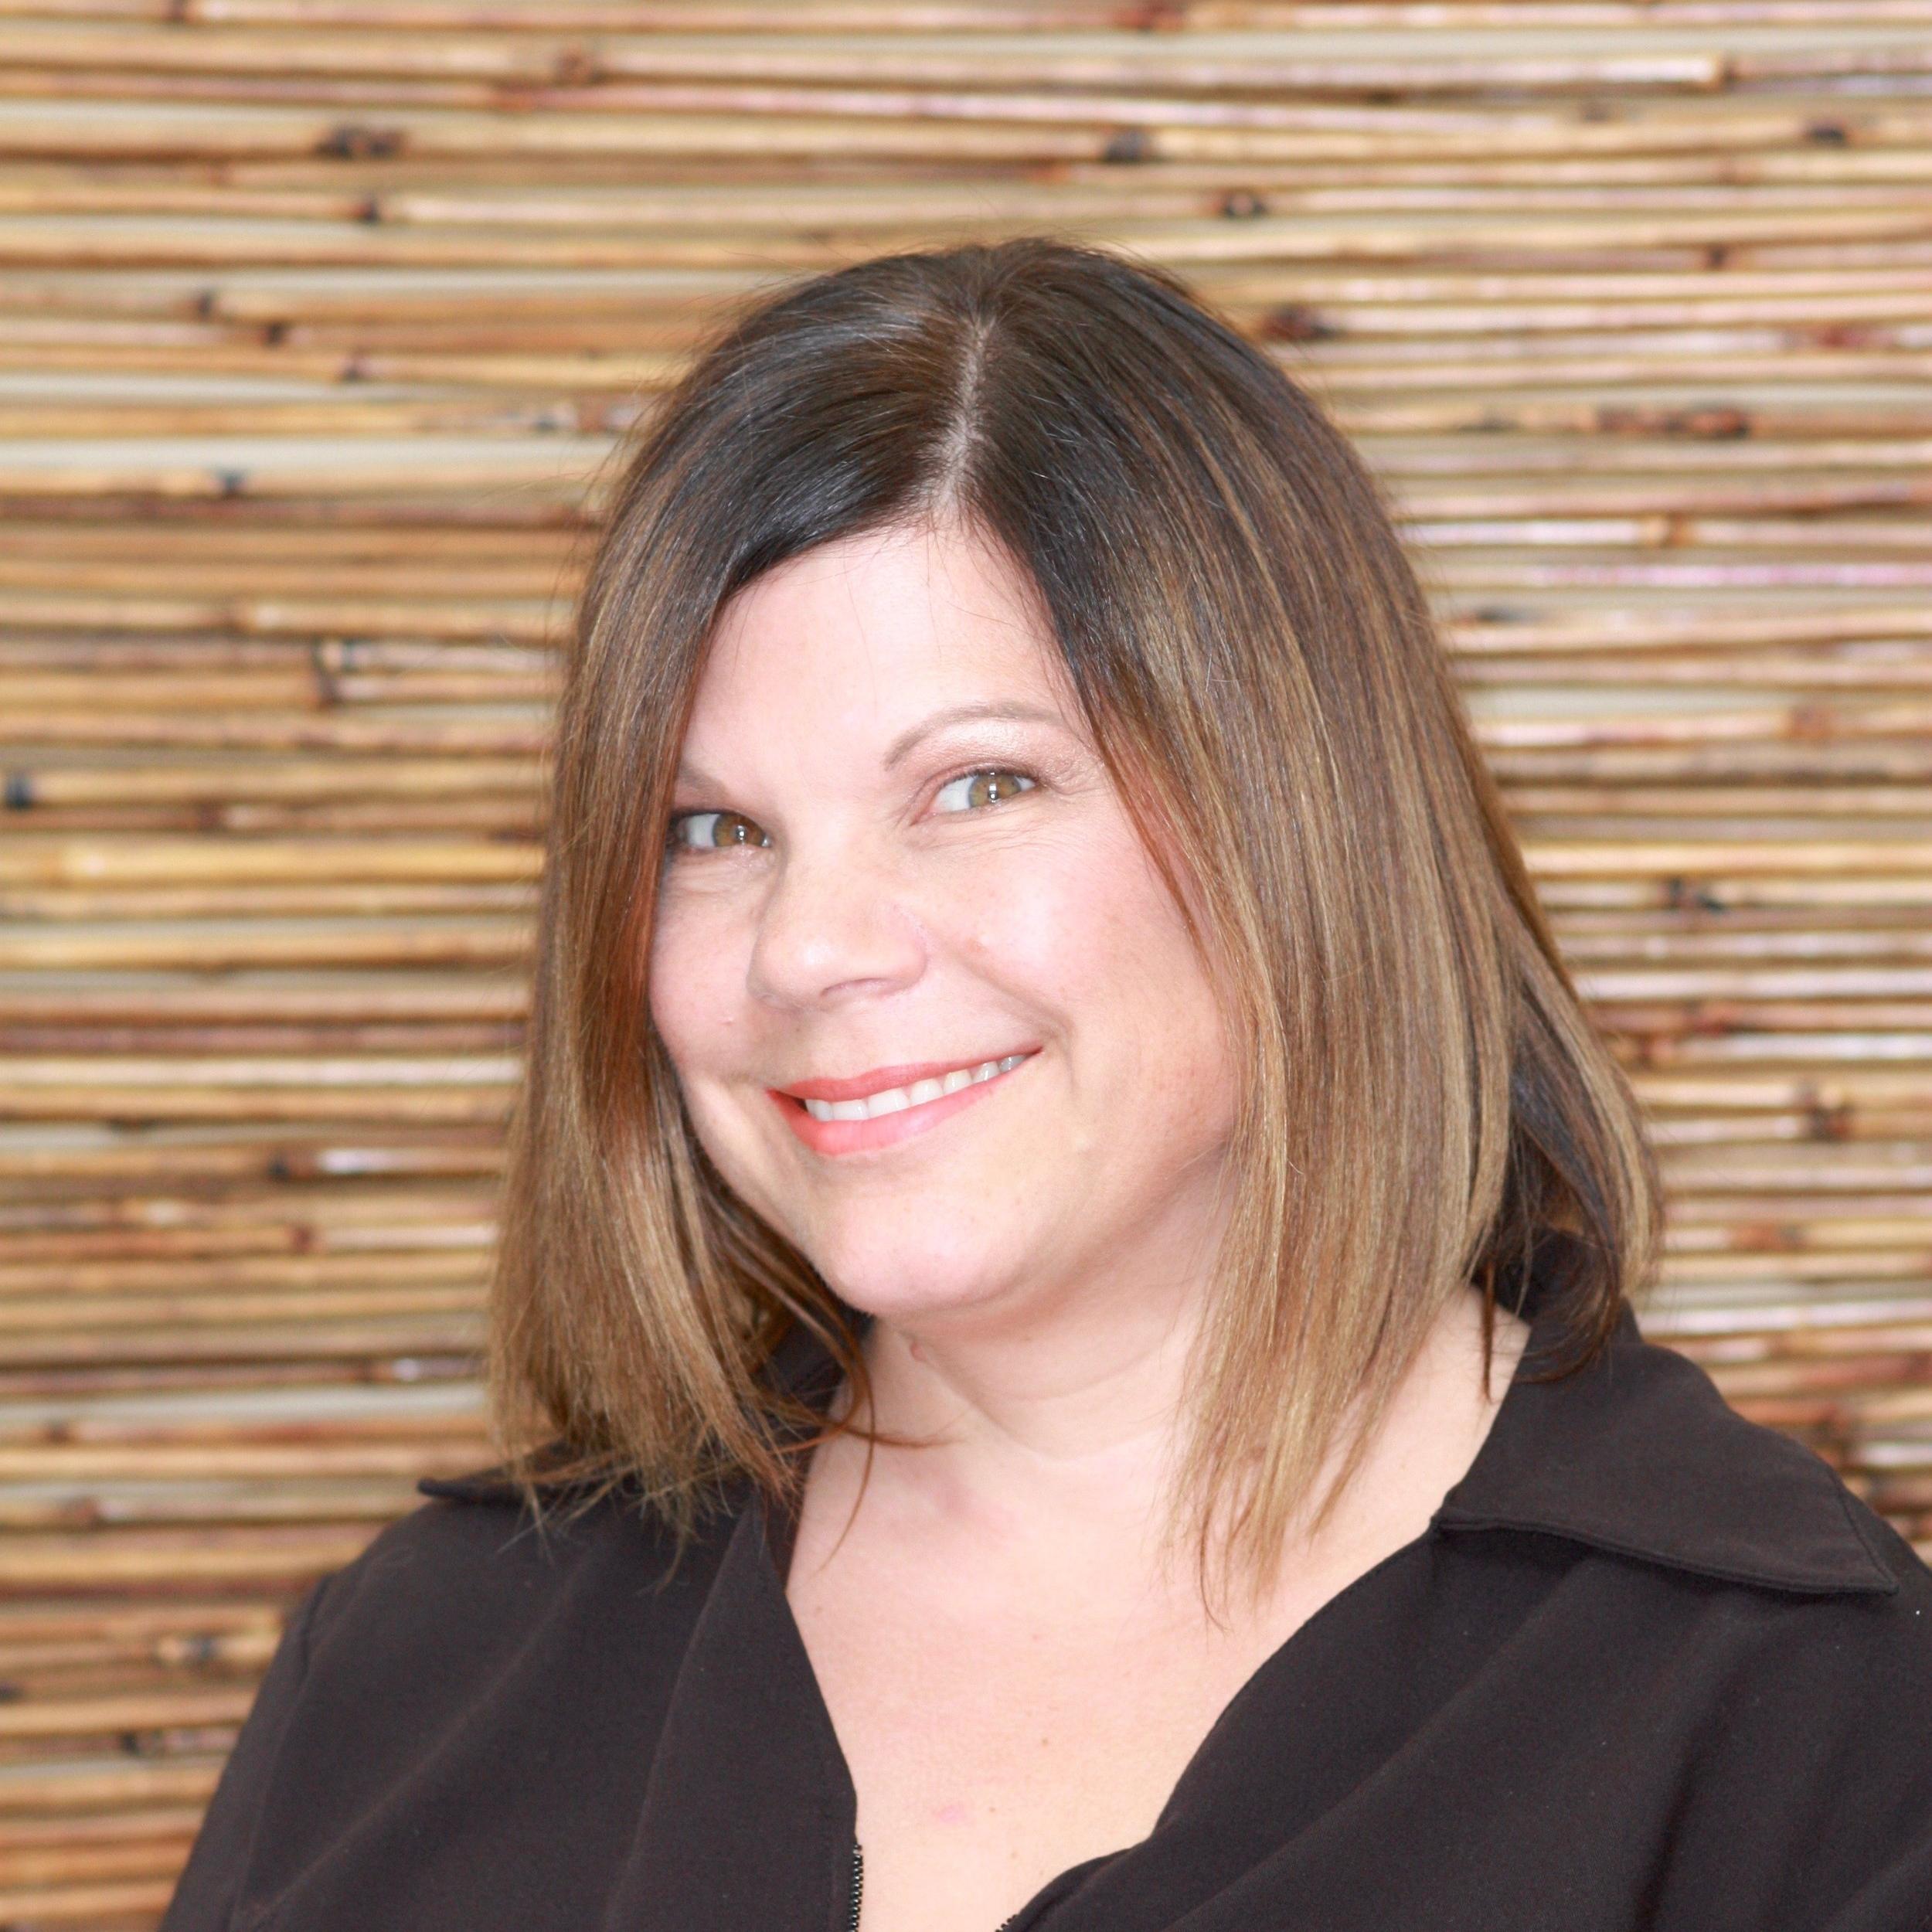 Tracey Ferguson DH, DA – Medical Administrator